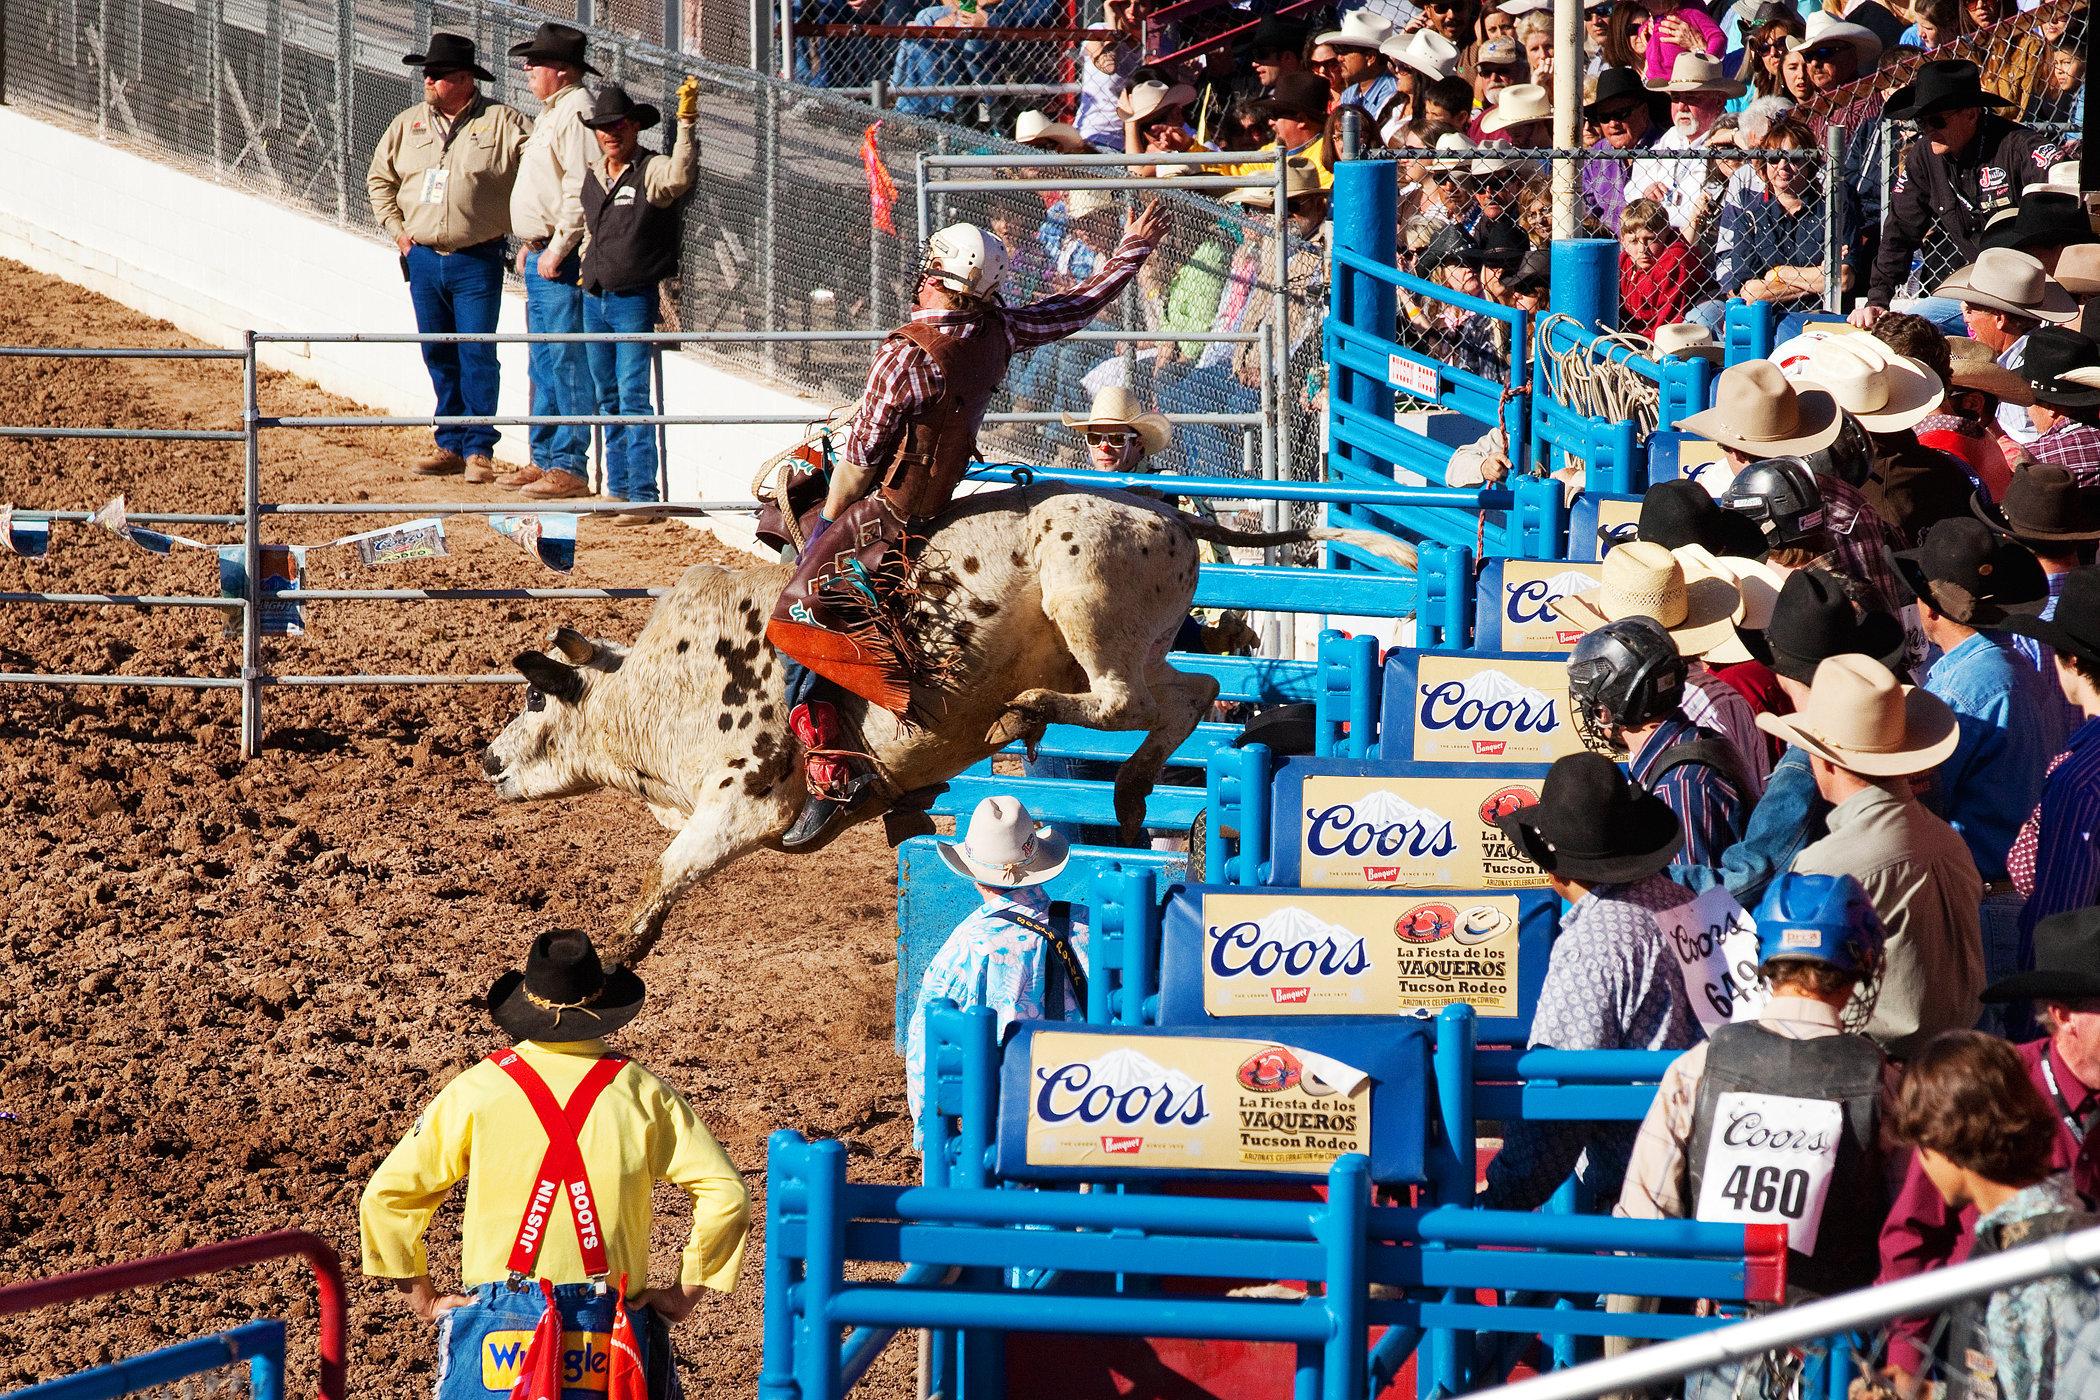 Tucson Rodeo III